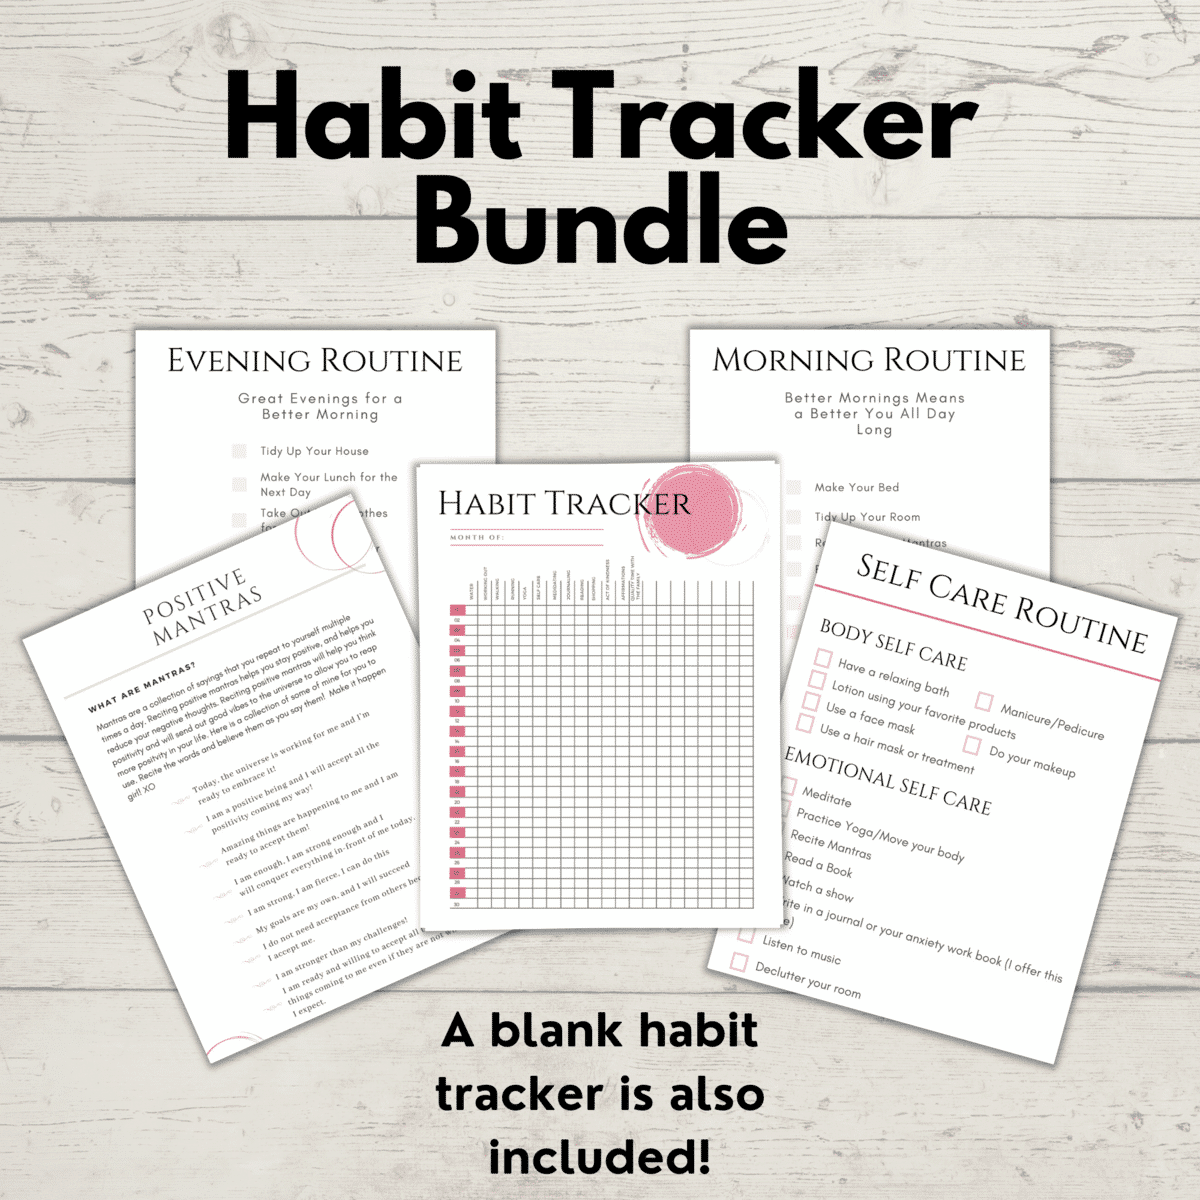 Habit Tracker Template for Moms